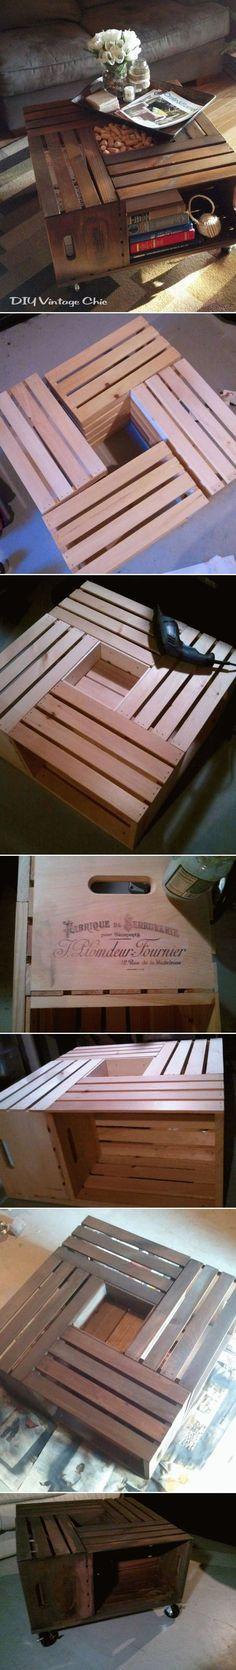 DIY Wine Crate Table